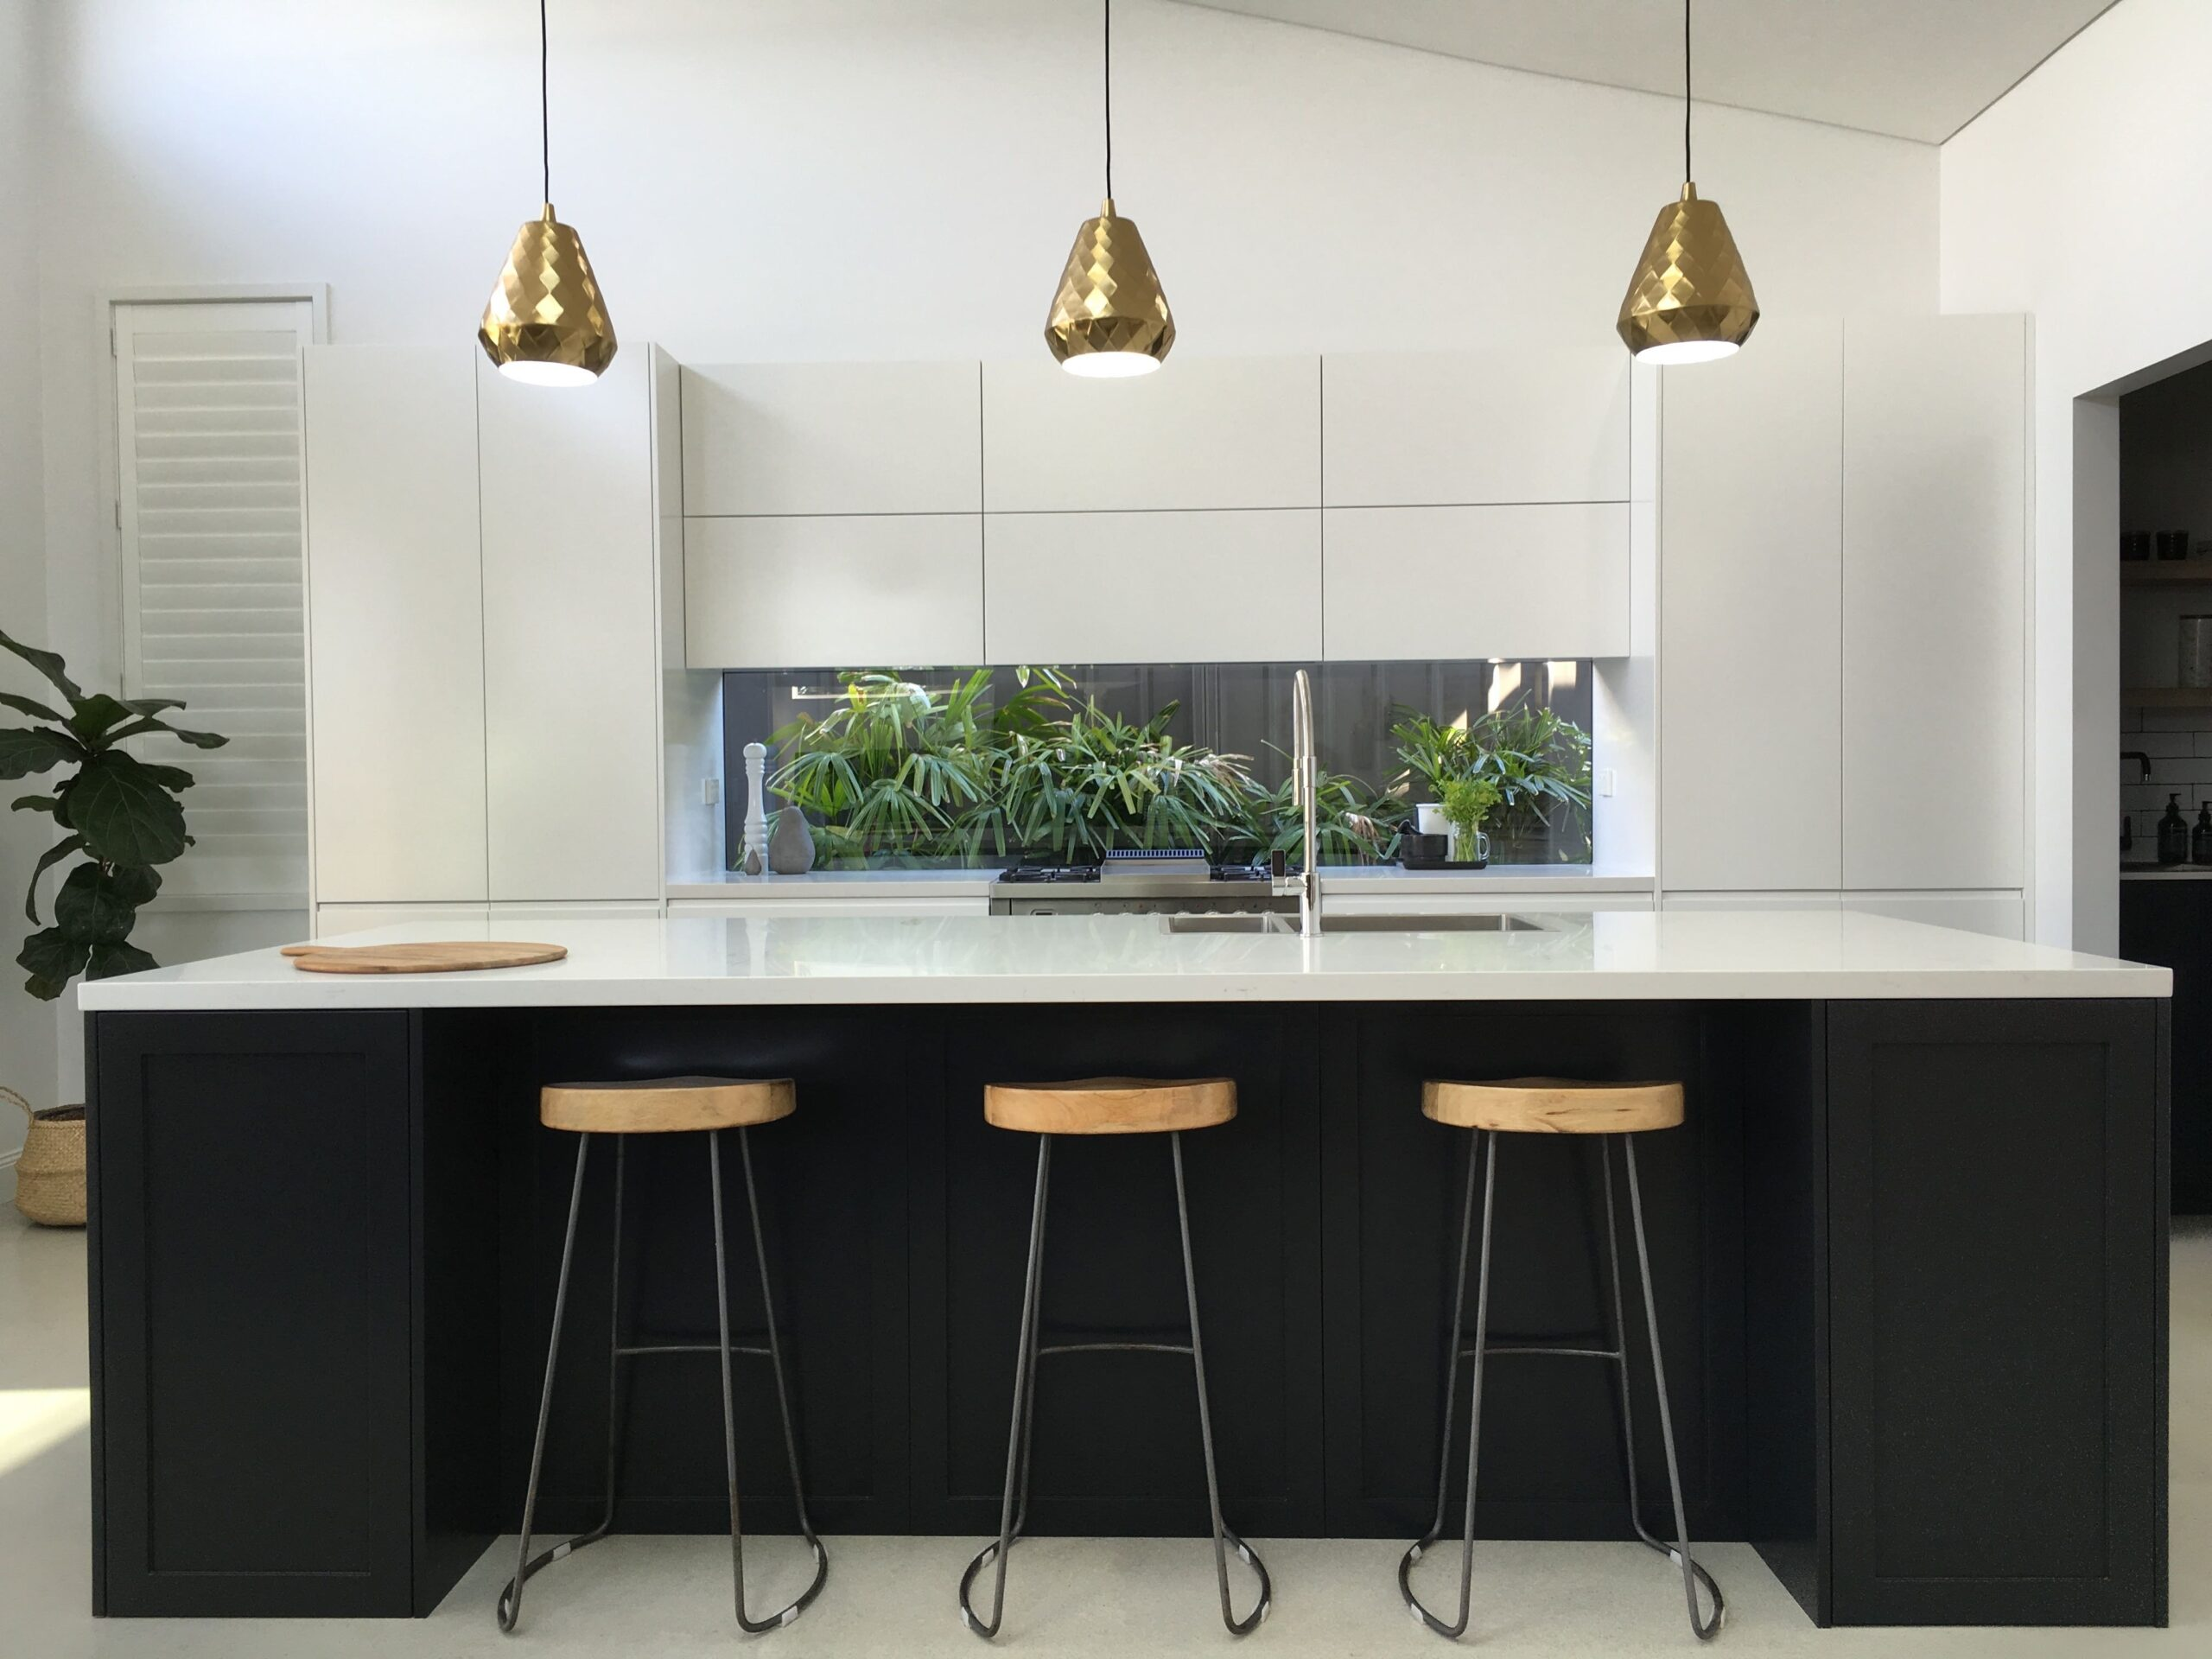 Full Size of Real Küchen Pingl Sur Kchenblock Regal Wohnzimmer Real Küchen